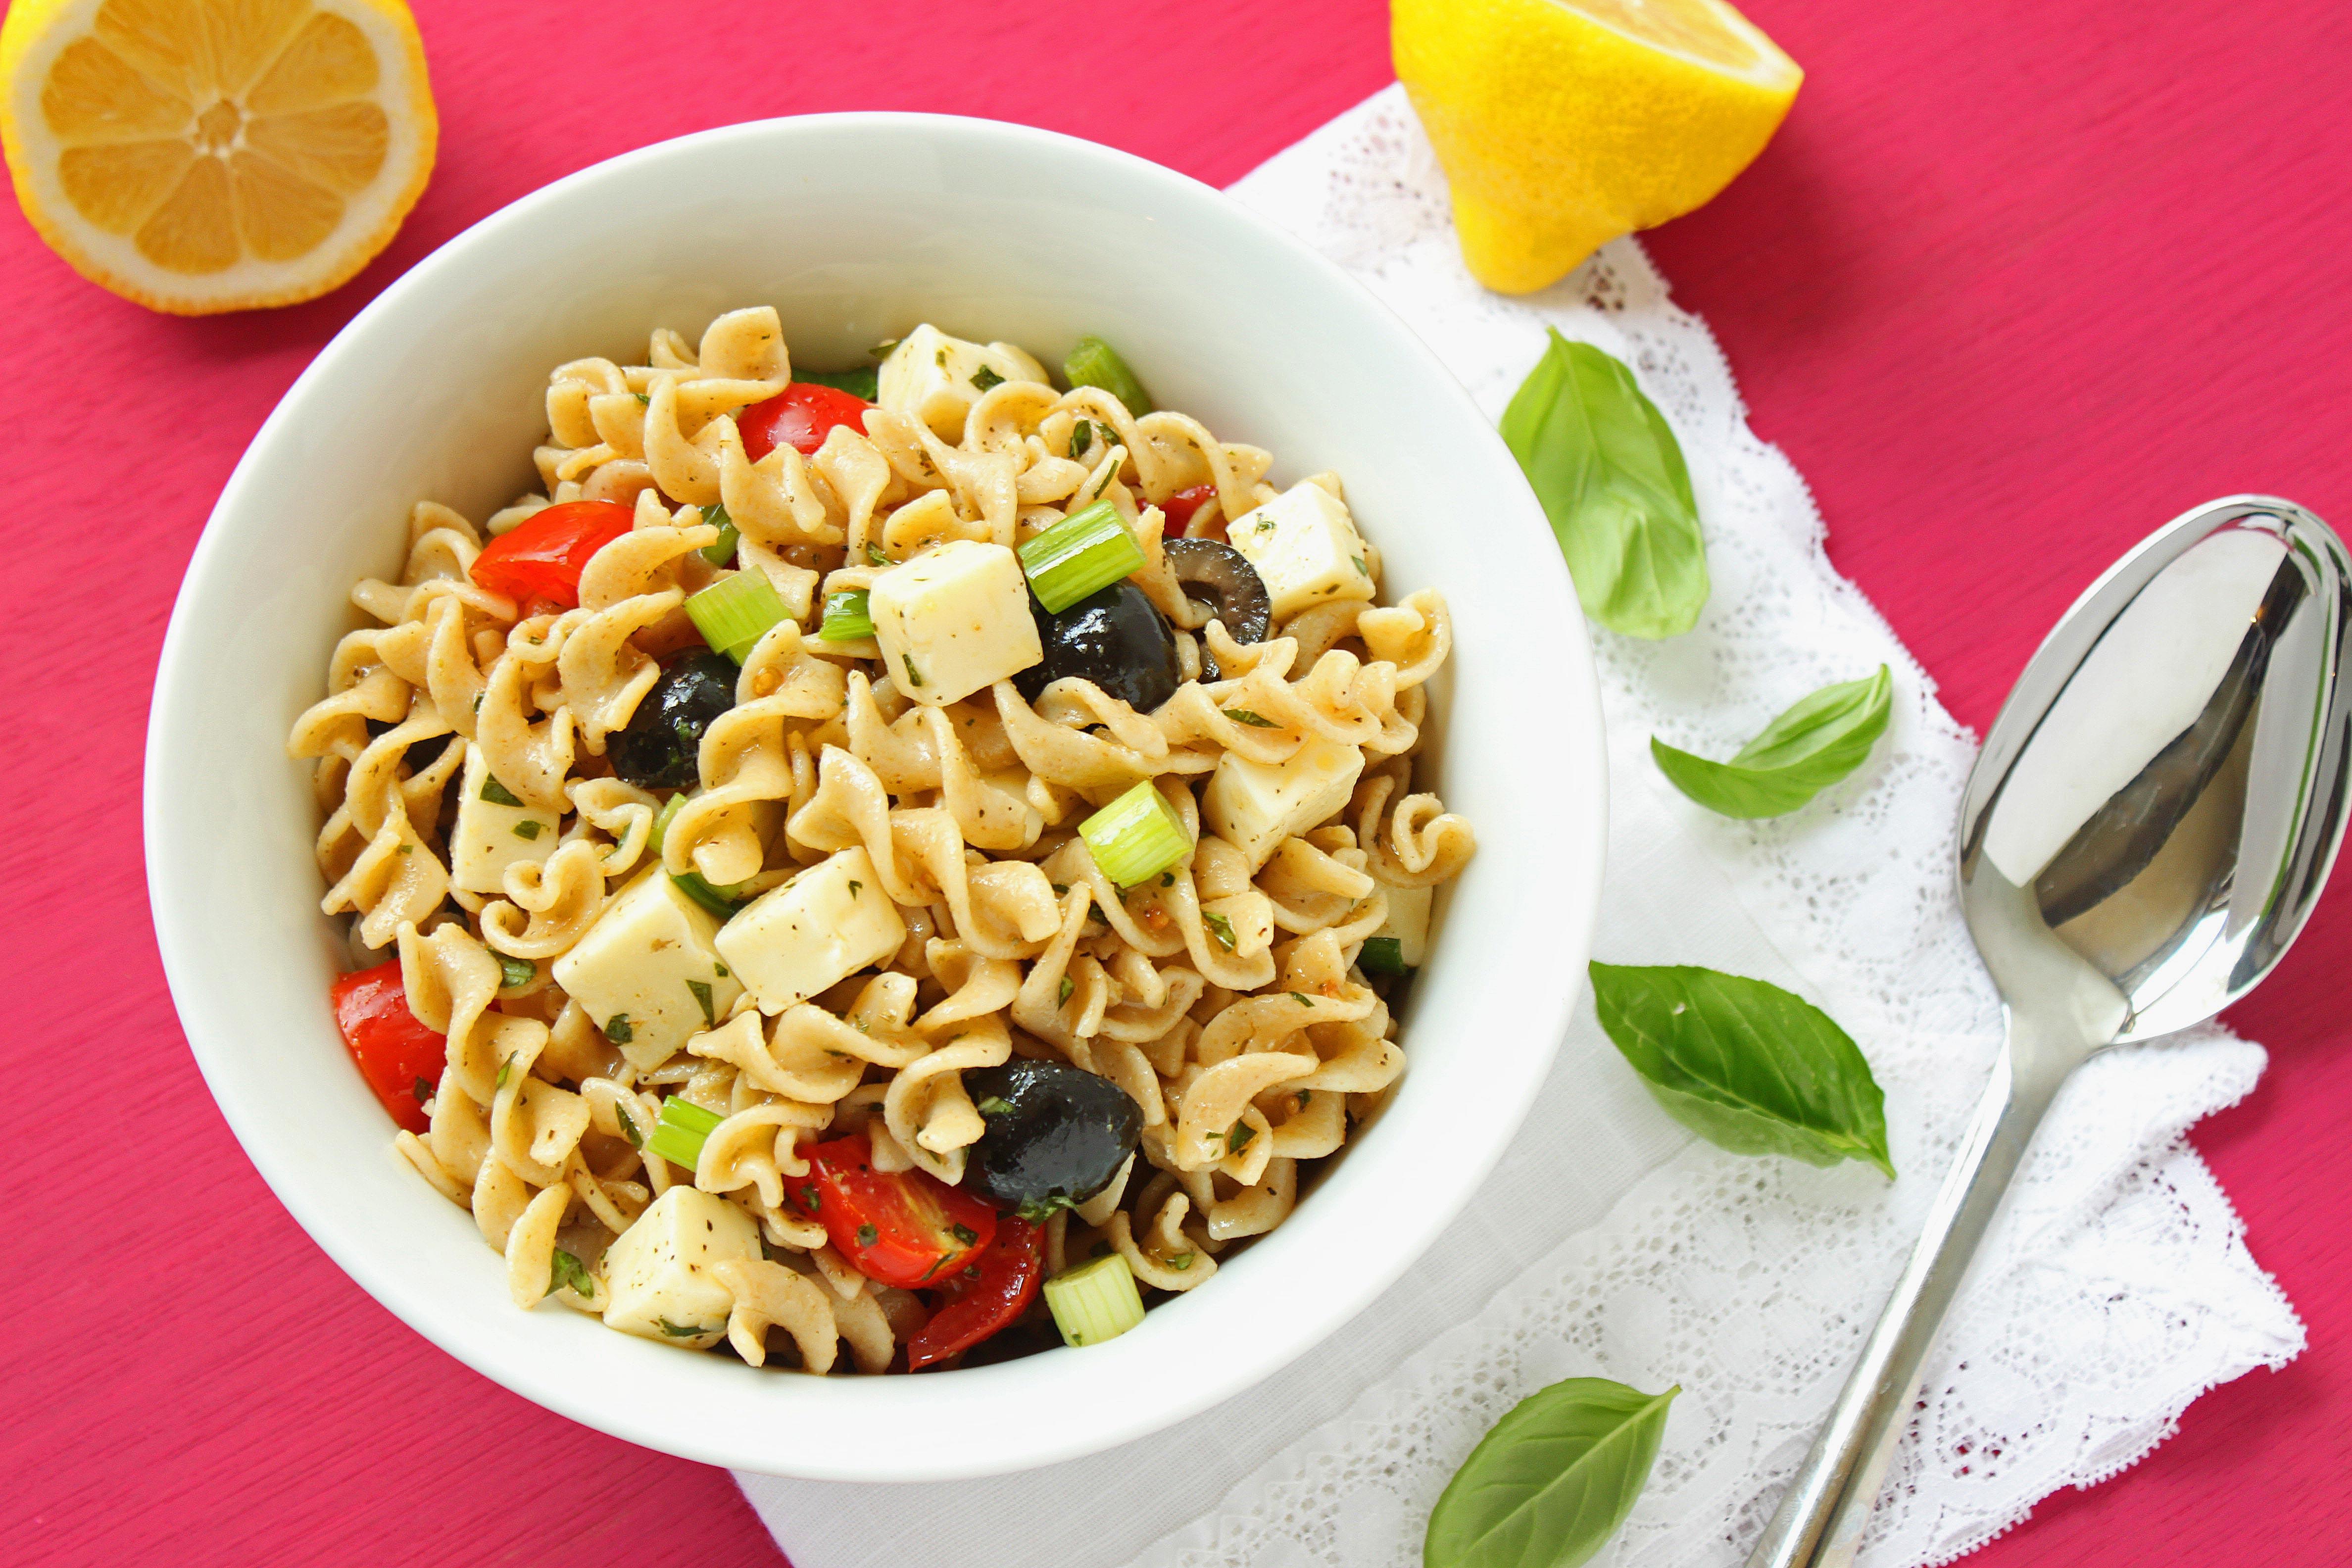 Healthy Pasta Salad Recipes  28 Best Healthy Pasta Salad healthy pasta salad